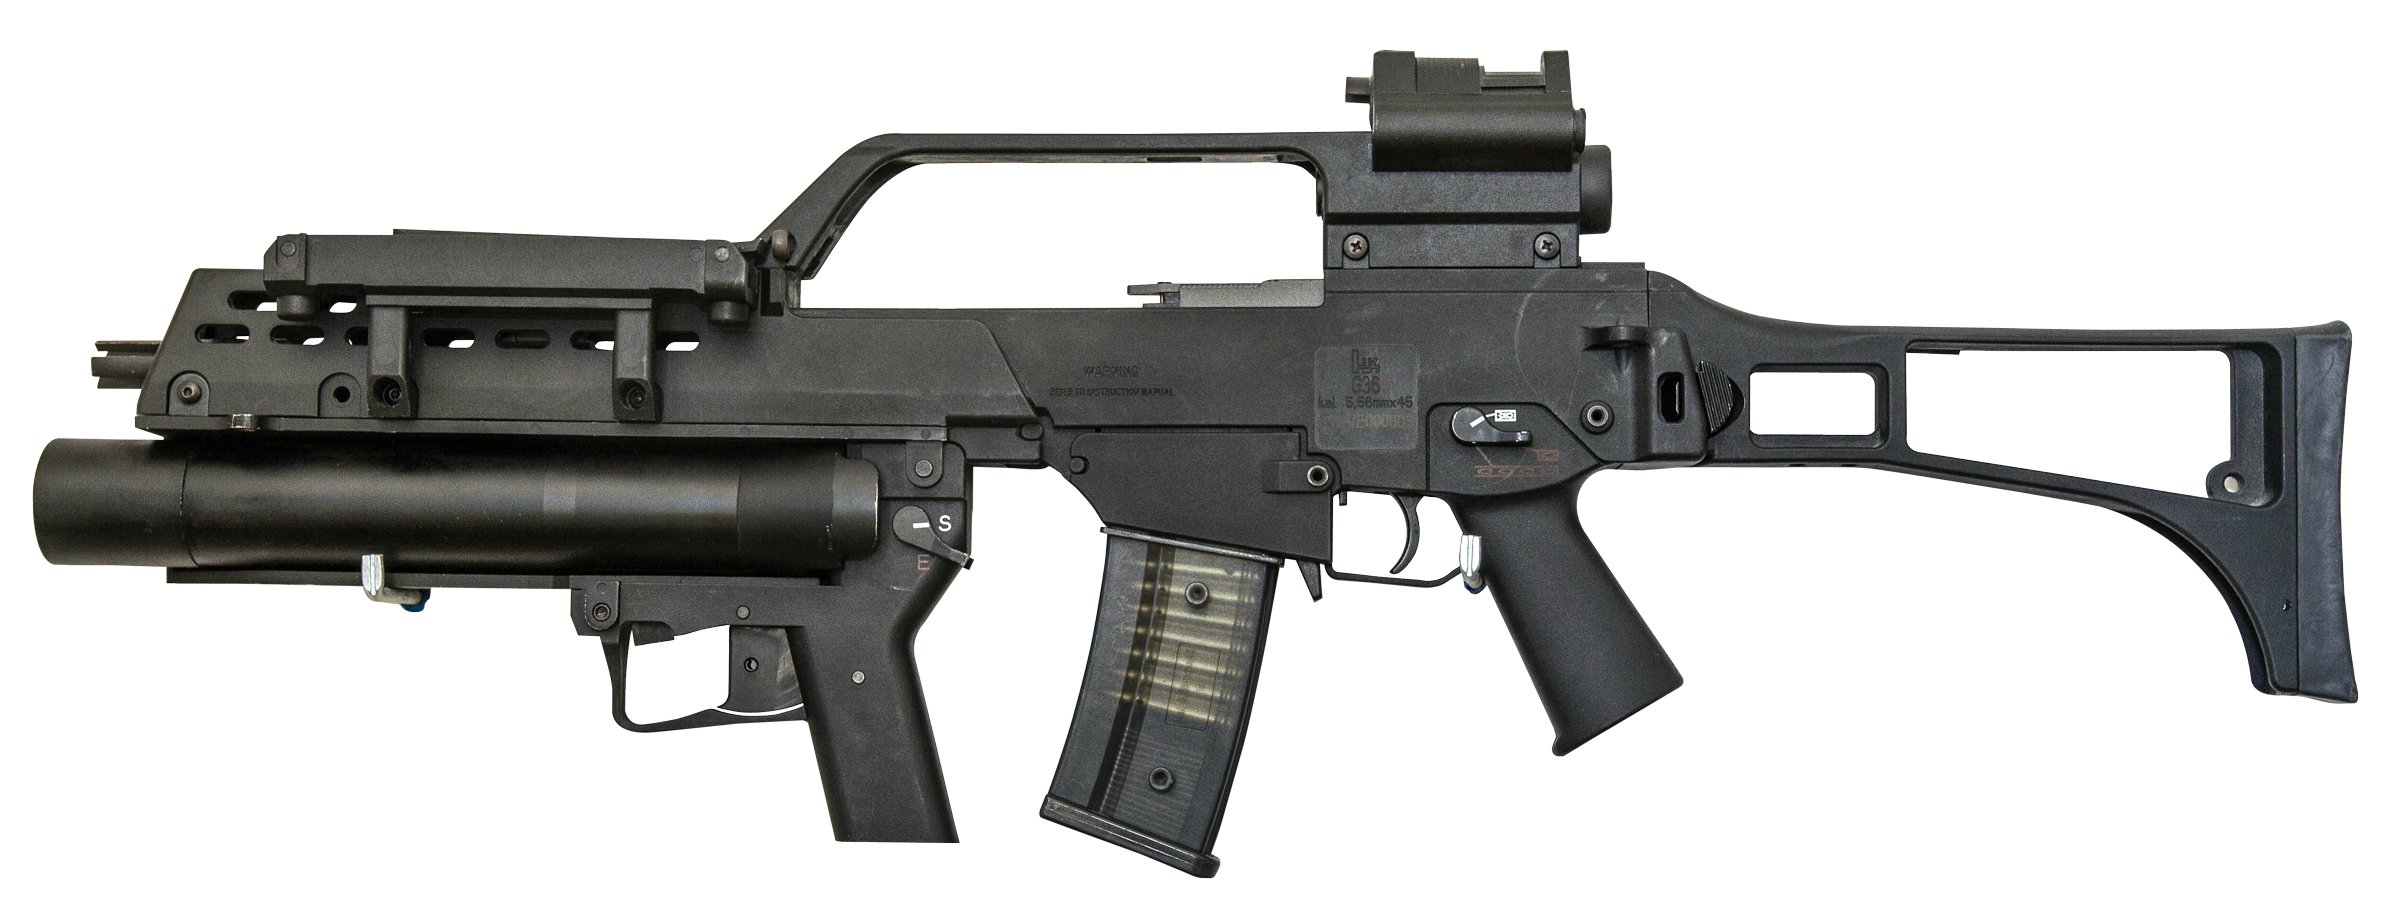 Grenade Launcher Gun PNG Transparent Image - Gun PNG